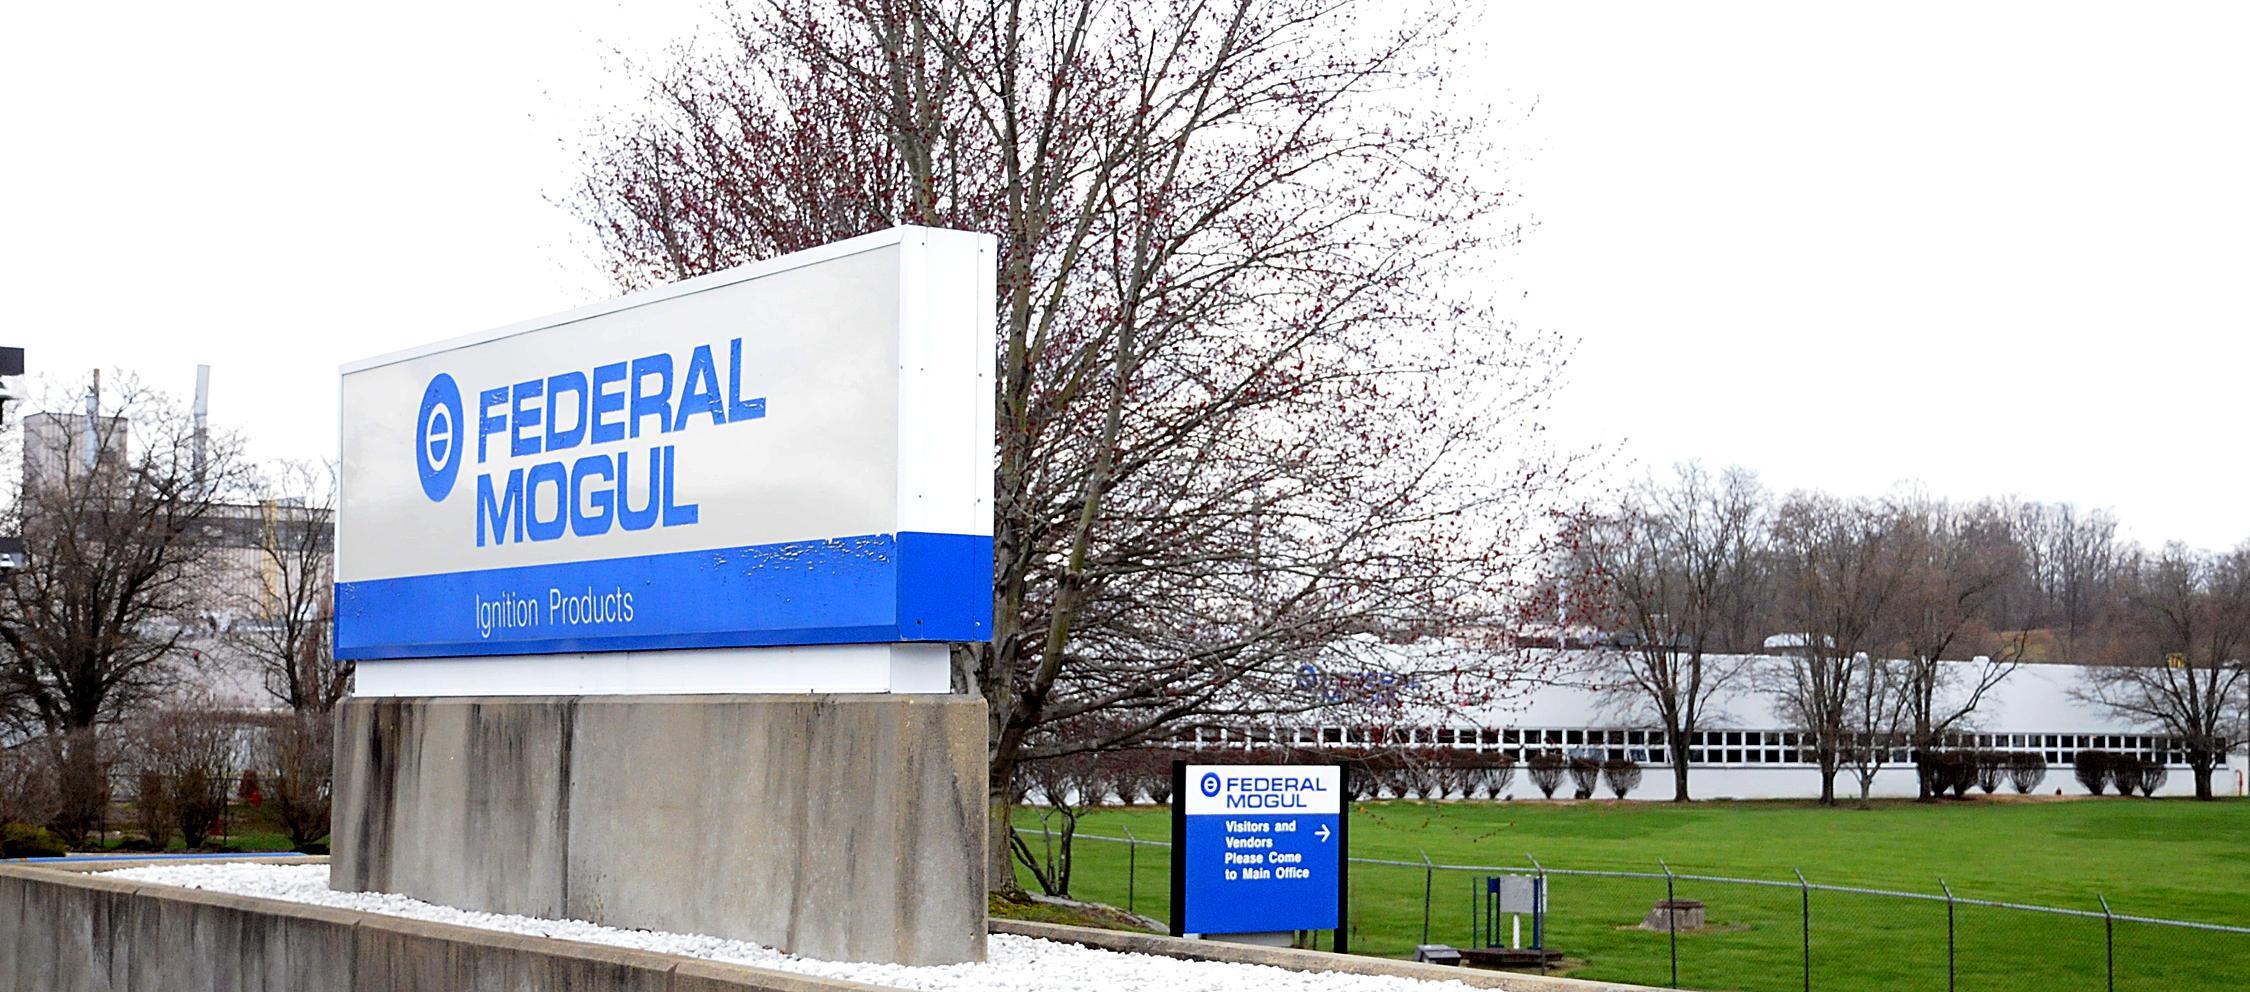 Tenneco Acquires Federal-Mogul in USD 5.4 Million Deal